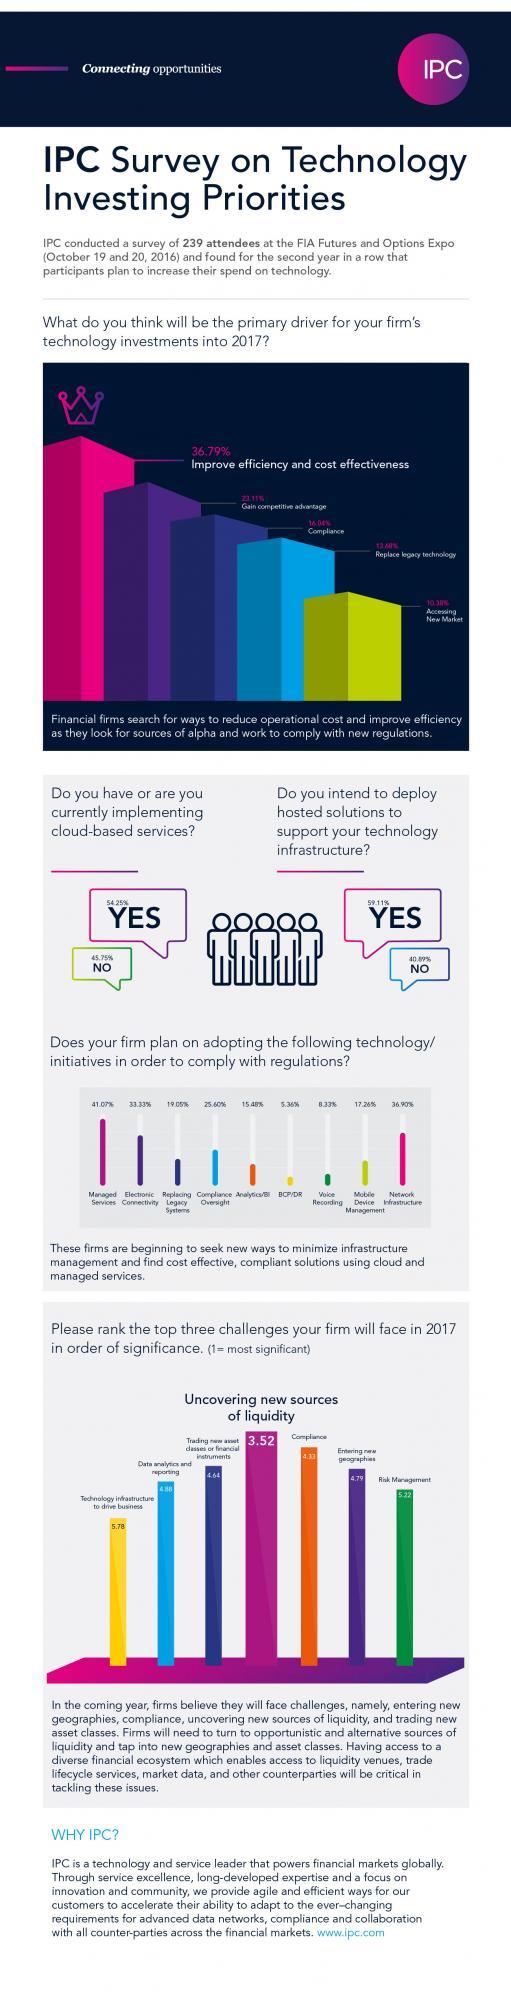 Infographic: IPC Survey on Technology Investing Priorities